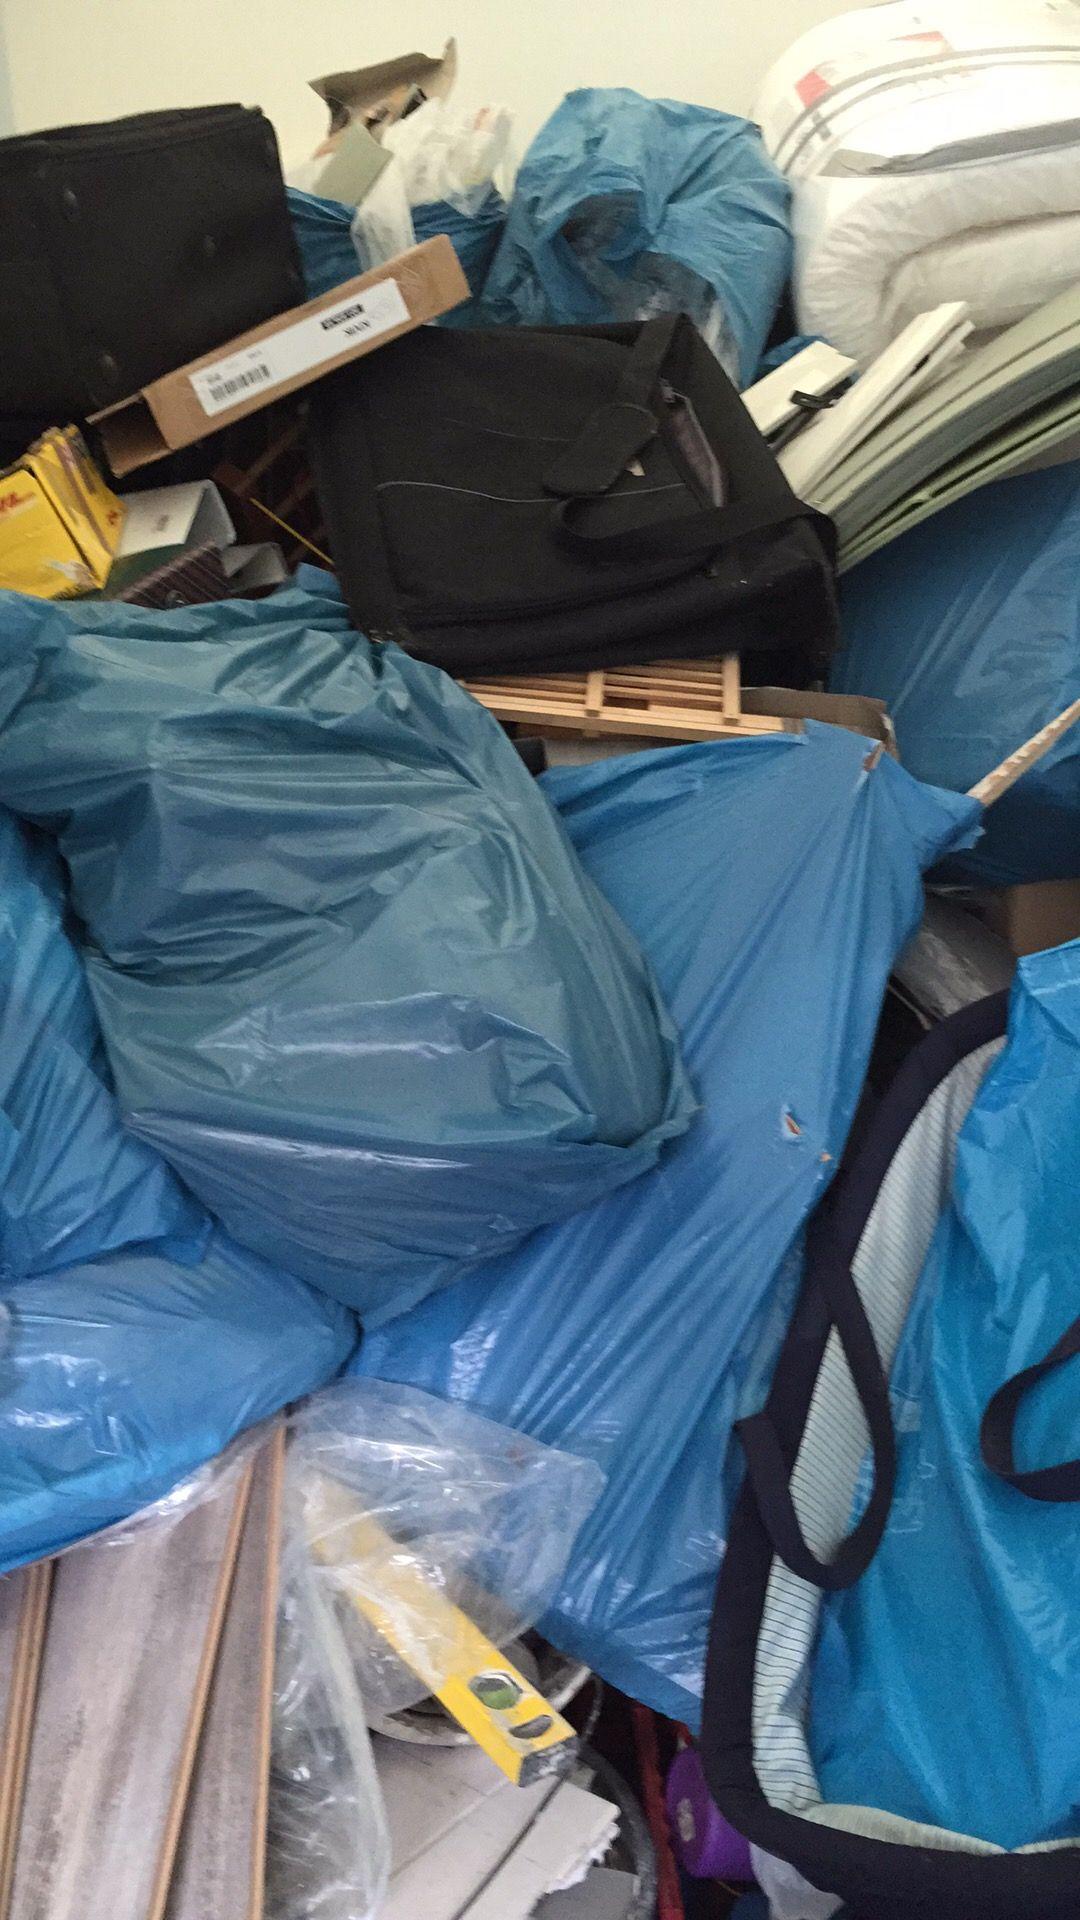 Recycling Tel.: 03060977577 Komplett Service Keller Wohnung Möbel ...